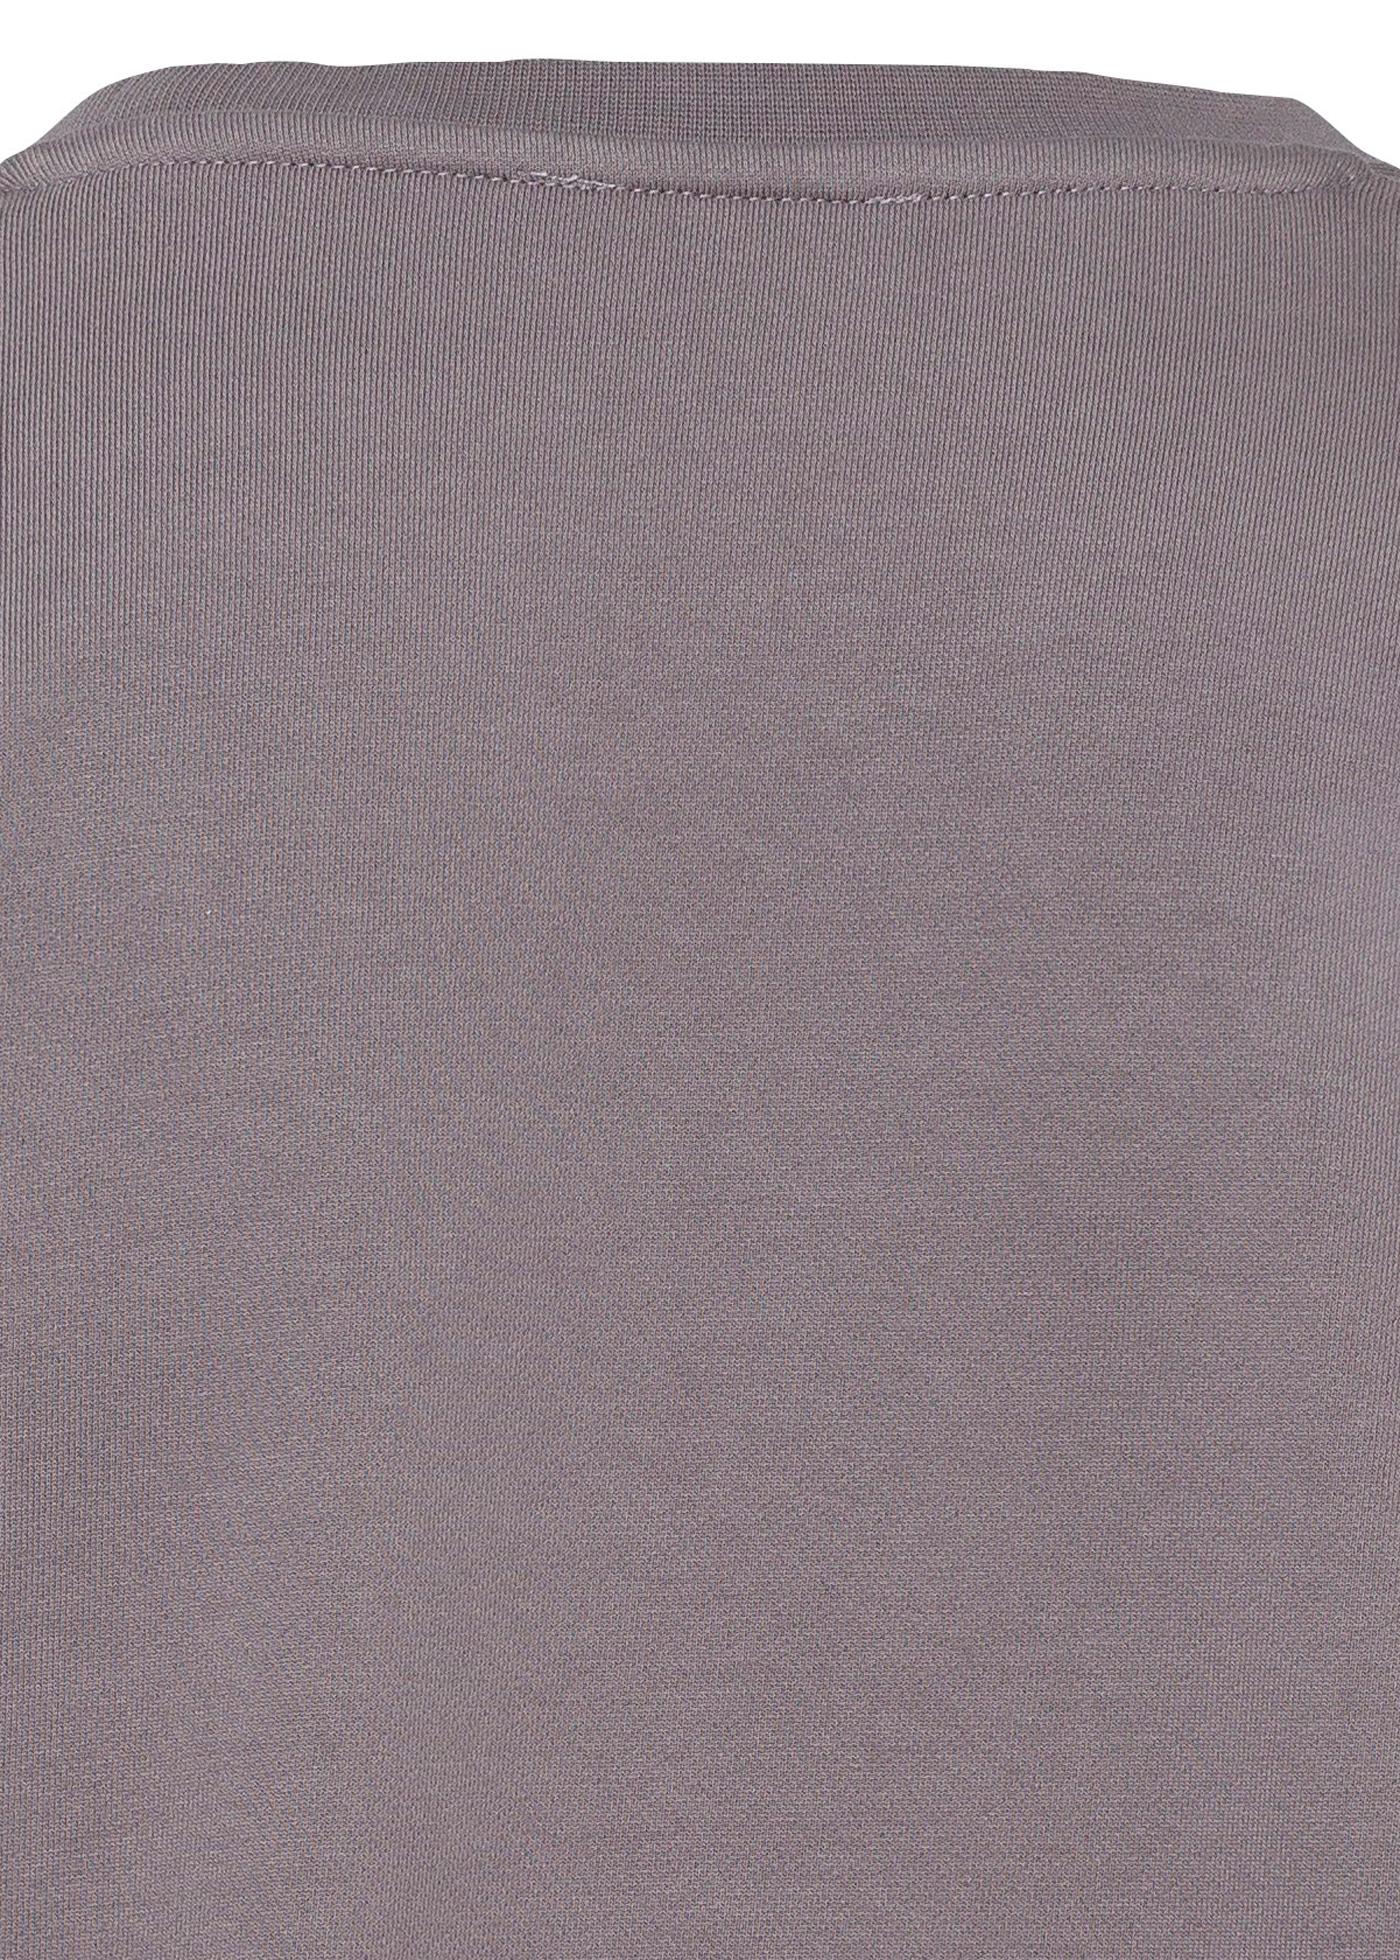 COLOURBLOCK OGO SWEATSHIRT image number 3